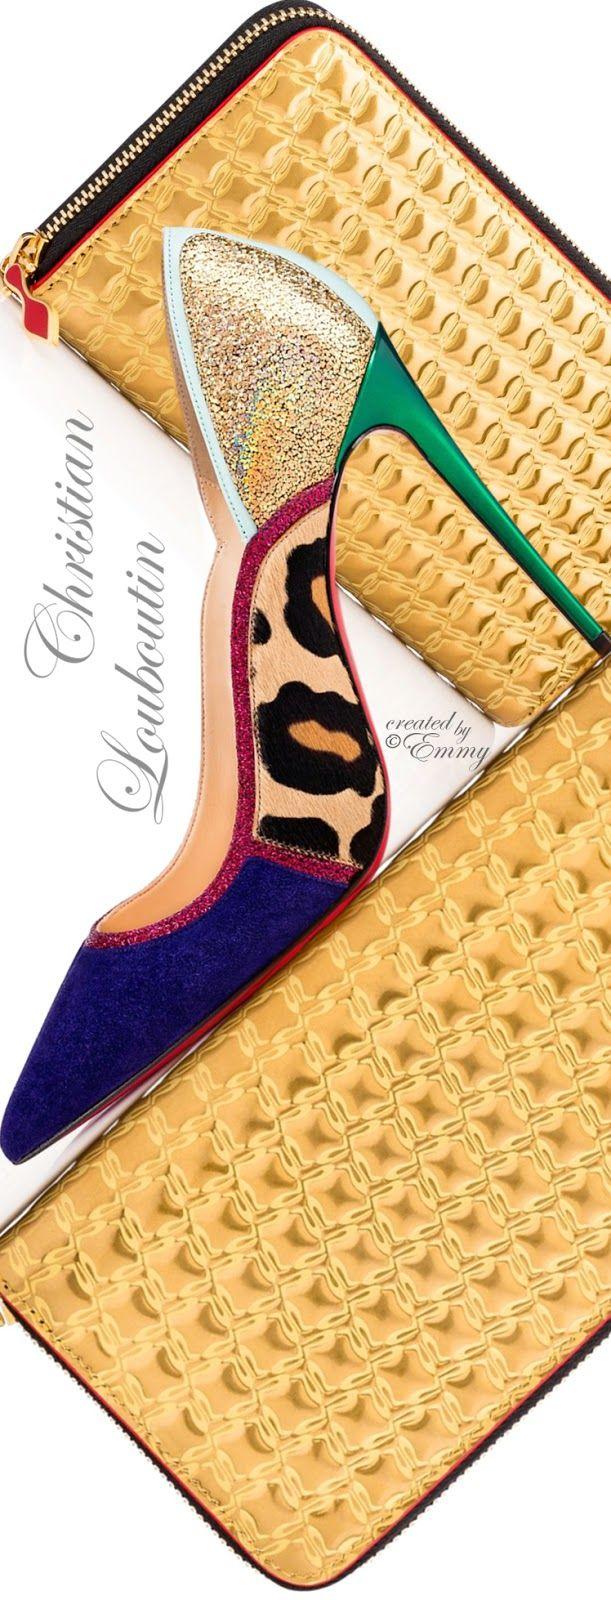 Christian Louboutin 'Serianina' Veau Velours-Pony & 'Panettone' Zipped Continental Wallet